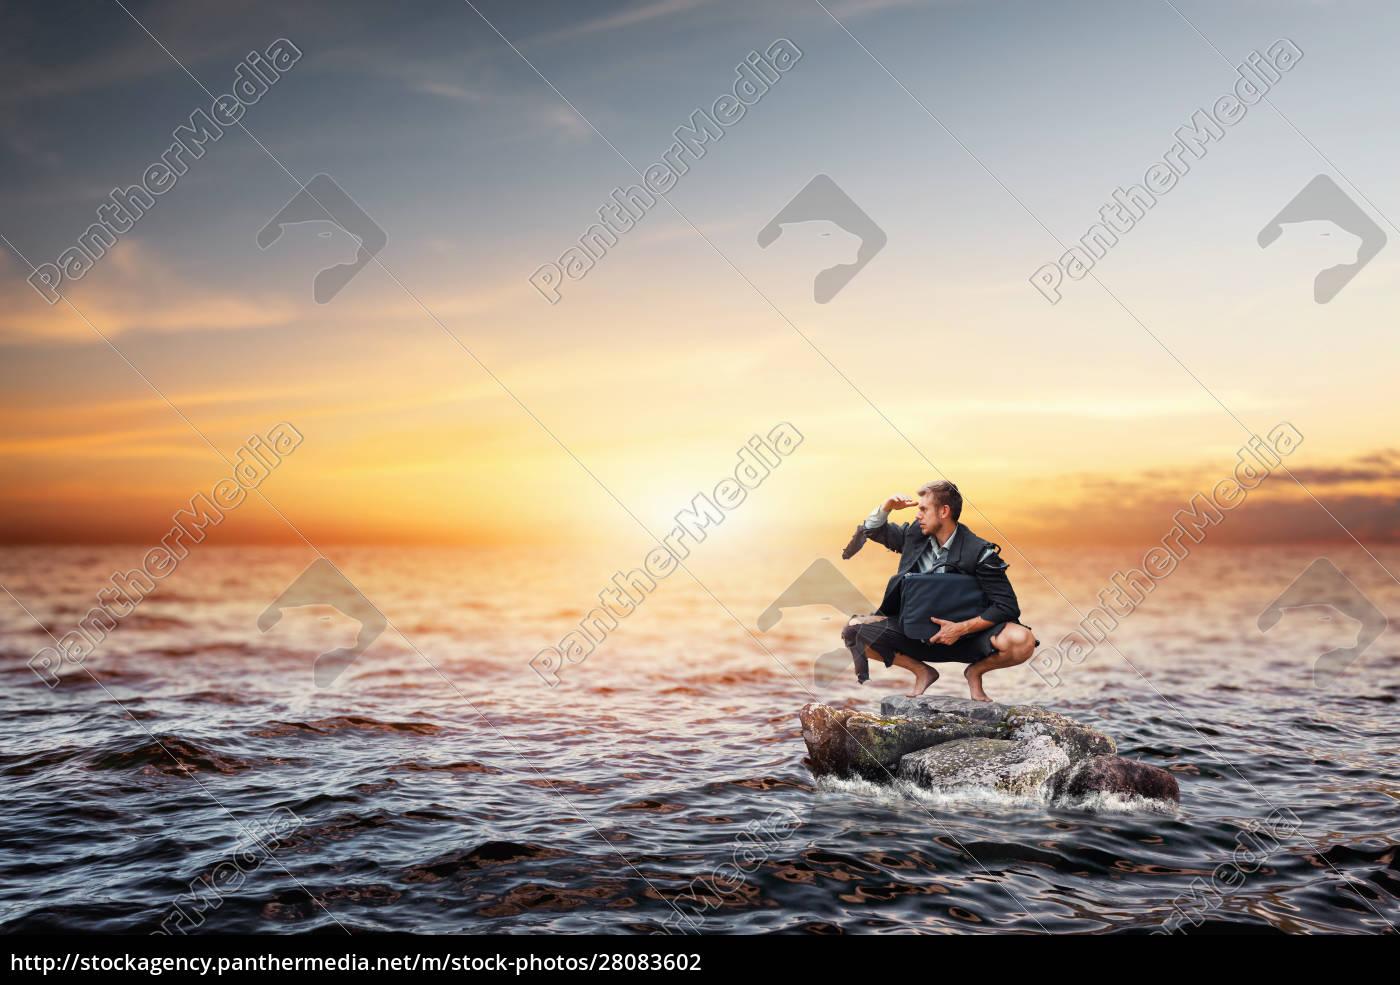 alone, businessman, sitting, on, the, stone - 28083602